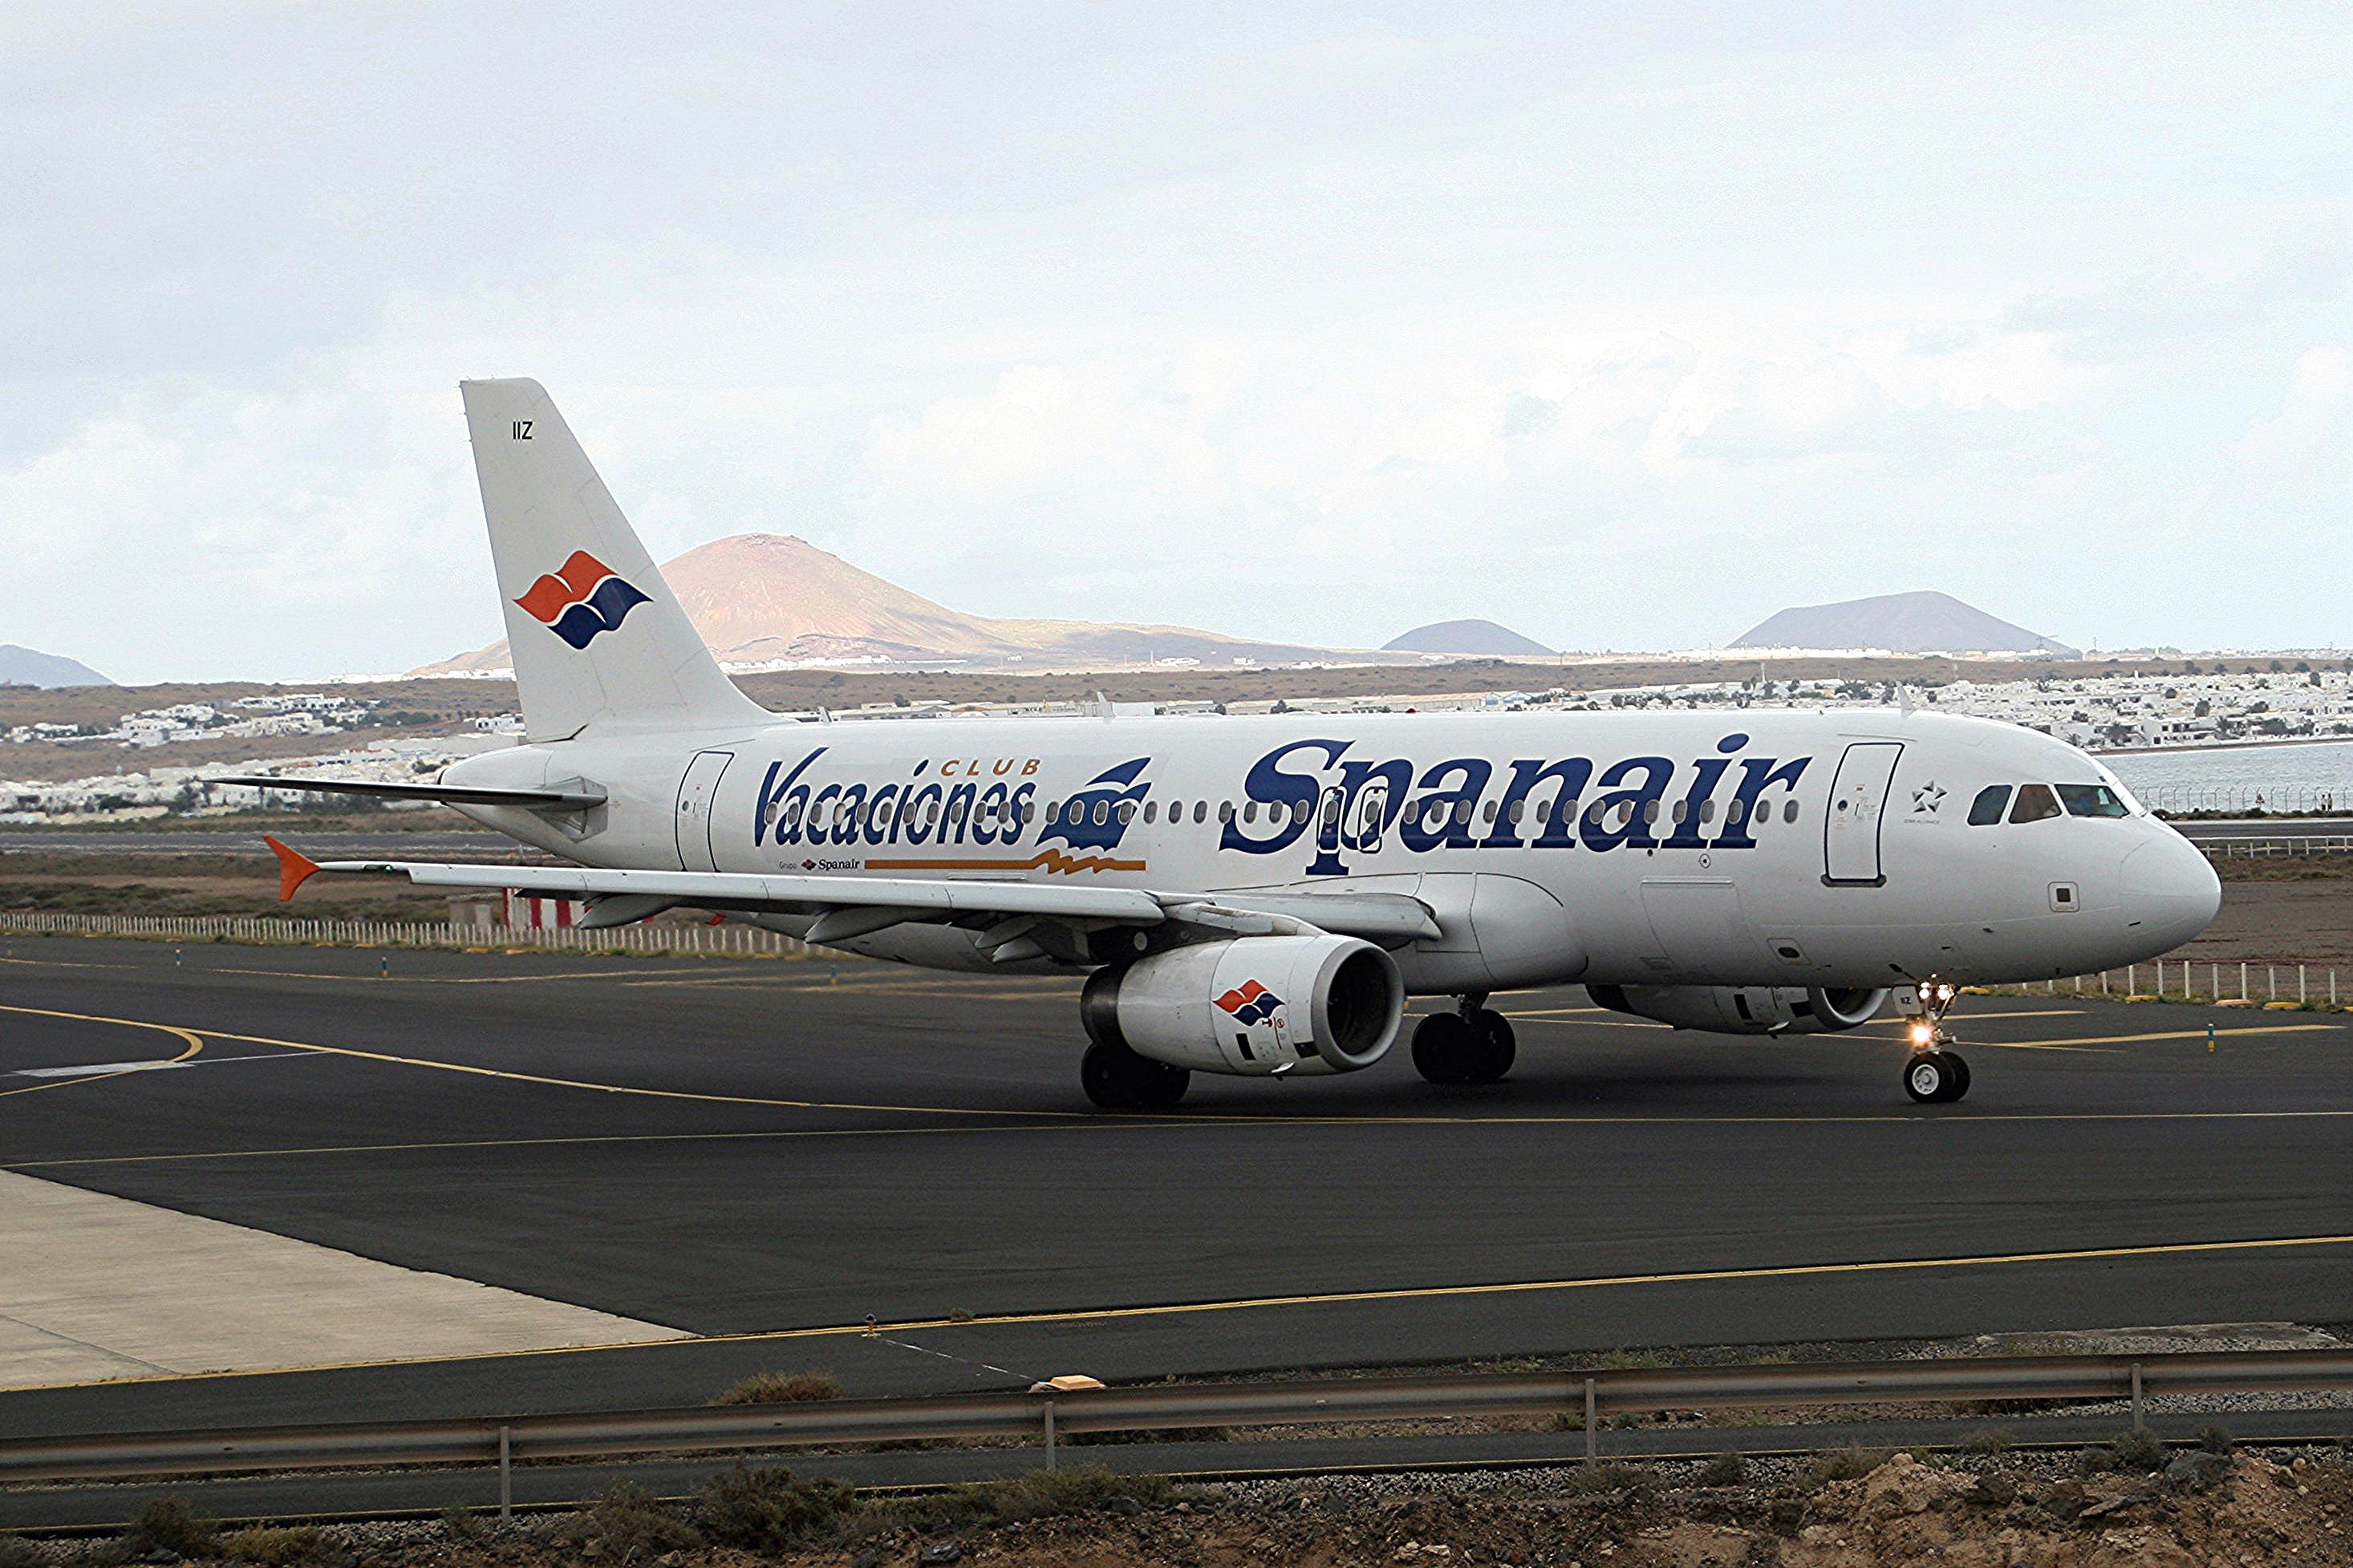 File:Spanair EC-IIZ A320 Arrecife(8) (38152195732) jpg - Wikimedia